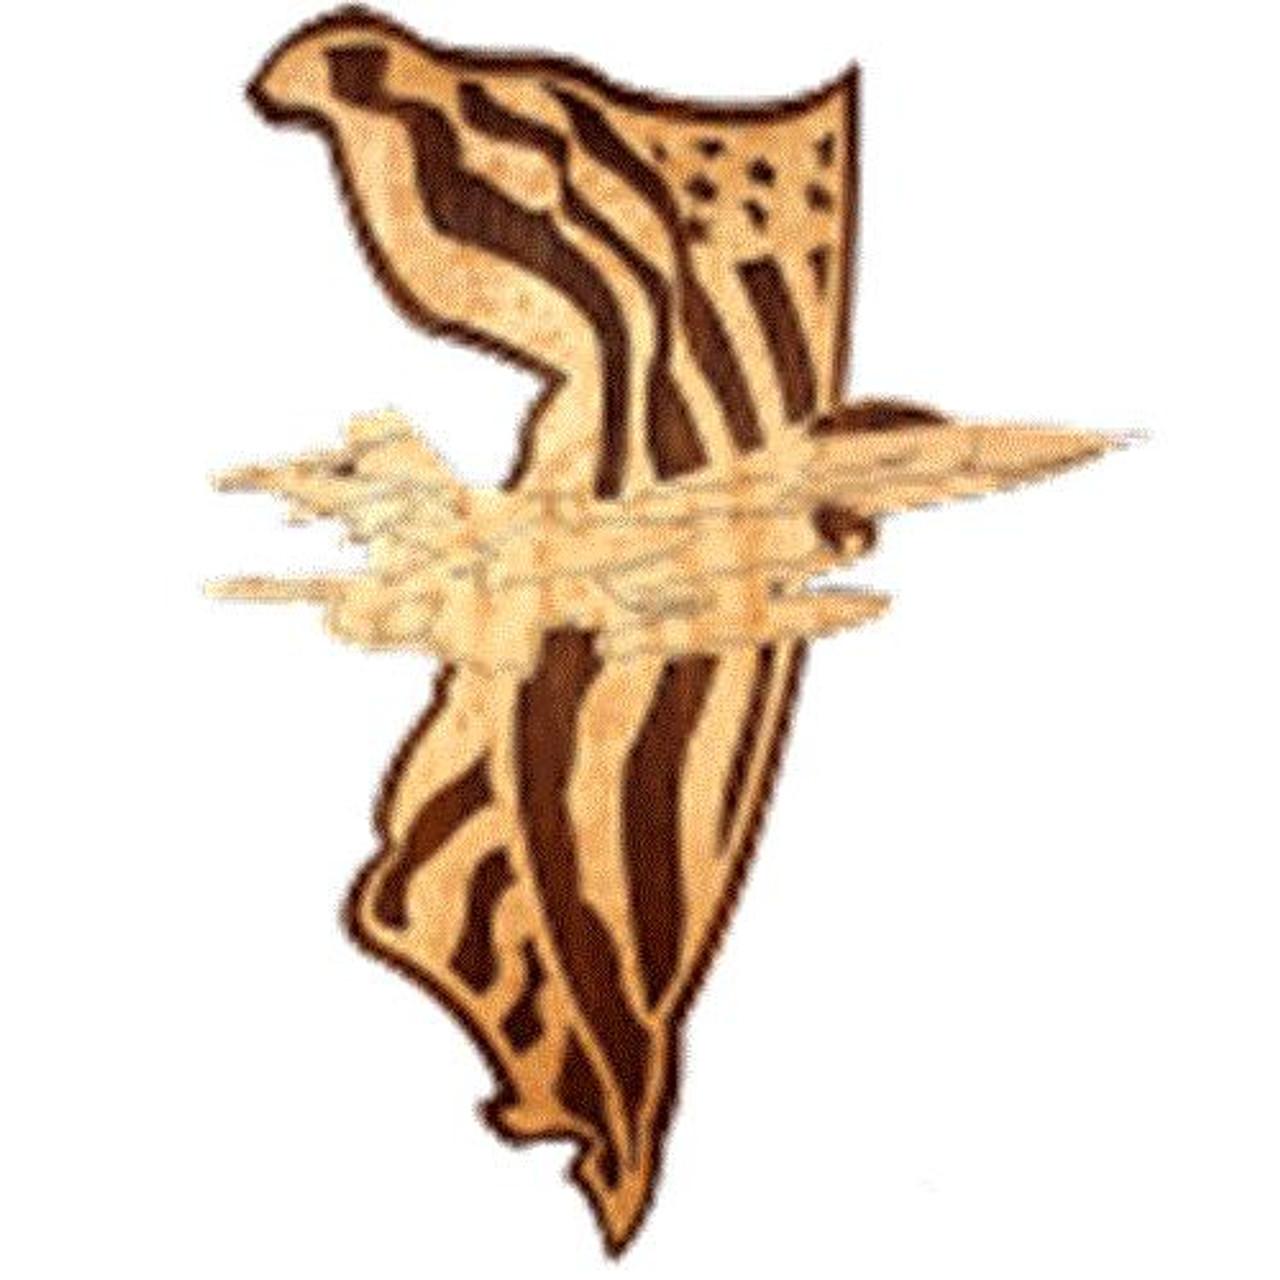 Wildwood Designs Freedom Fighter Plan